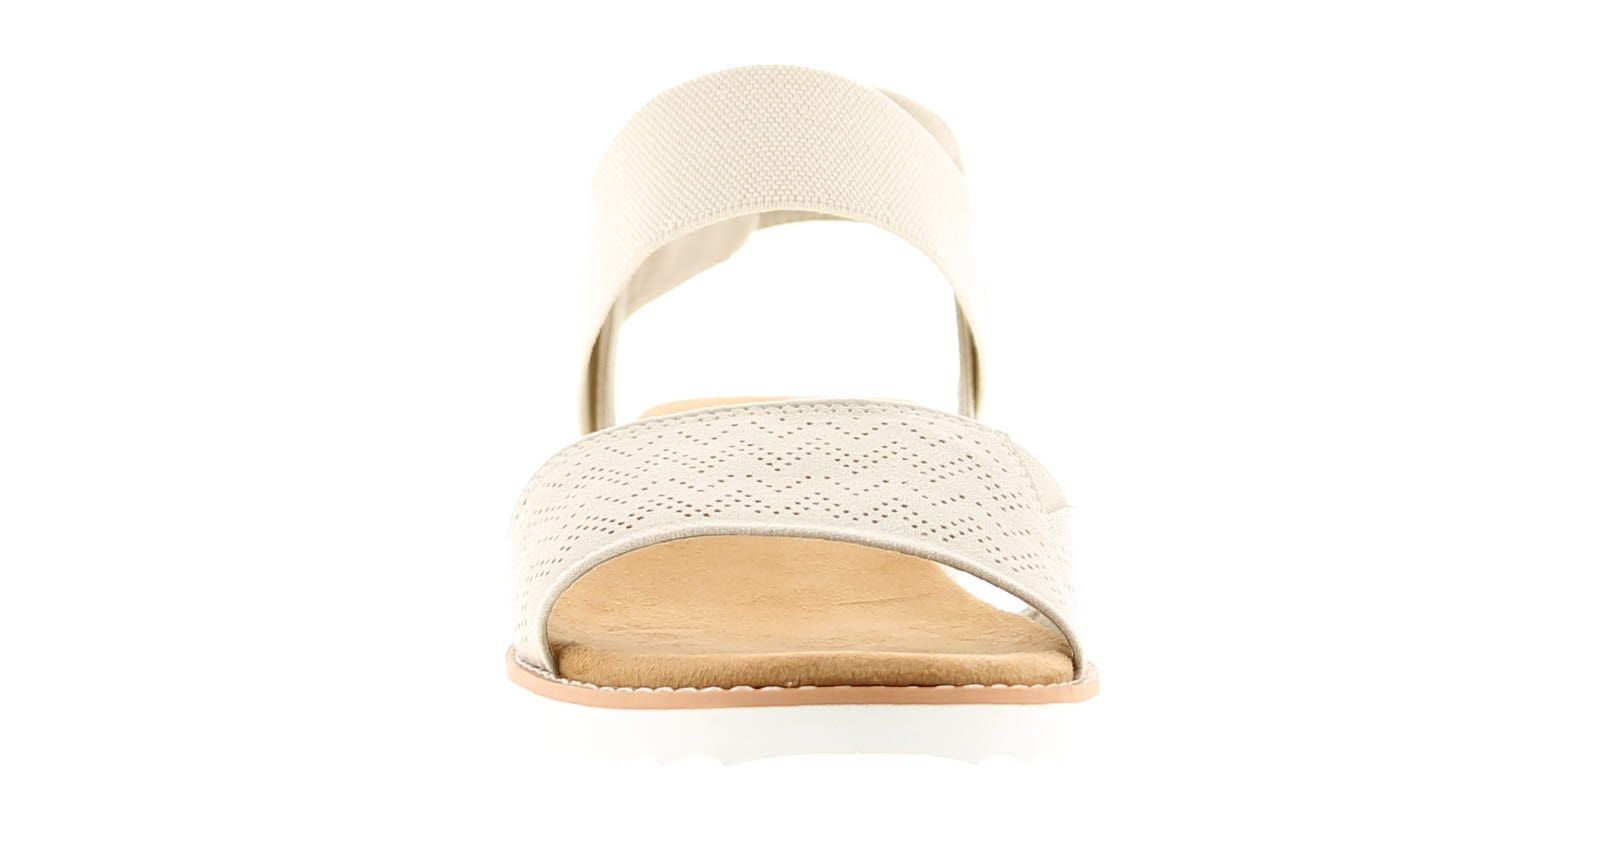 Skechers Desert Kiss Womens Wedge Sandals Off White 1 1/4 Inch Built In Heel